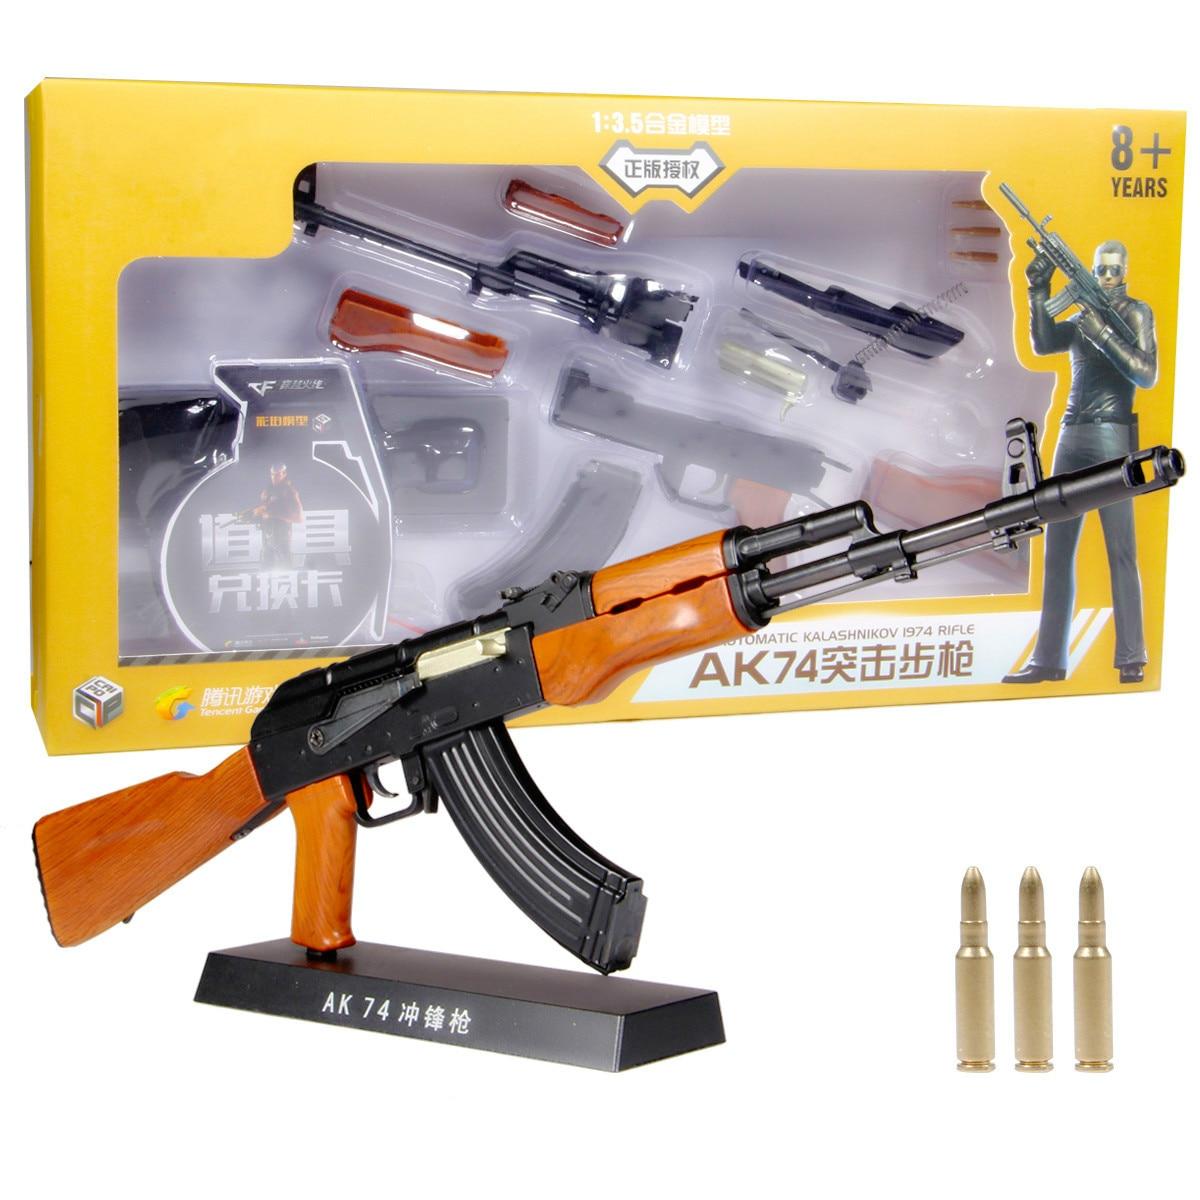 Metal toy gun guns arma armas silah sniper rifle ak47 model armas...